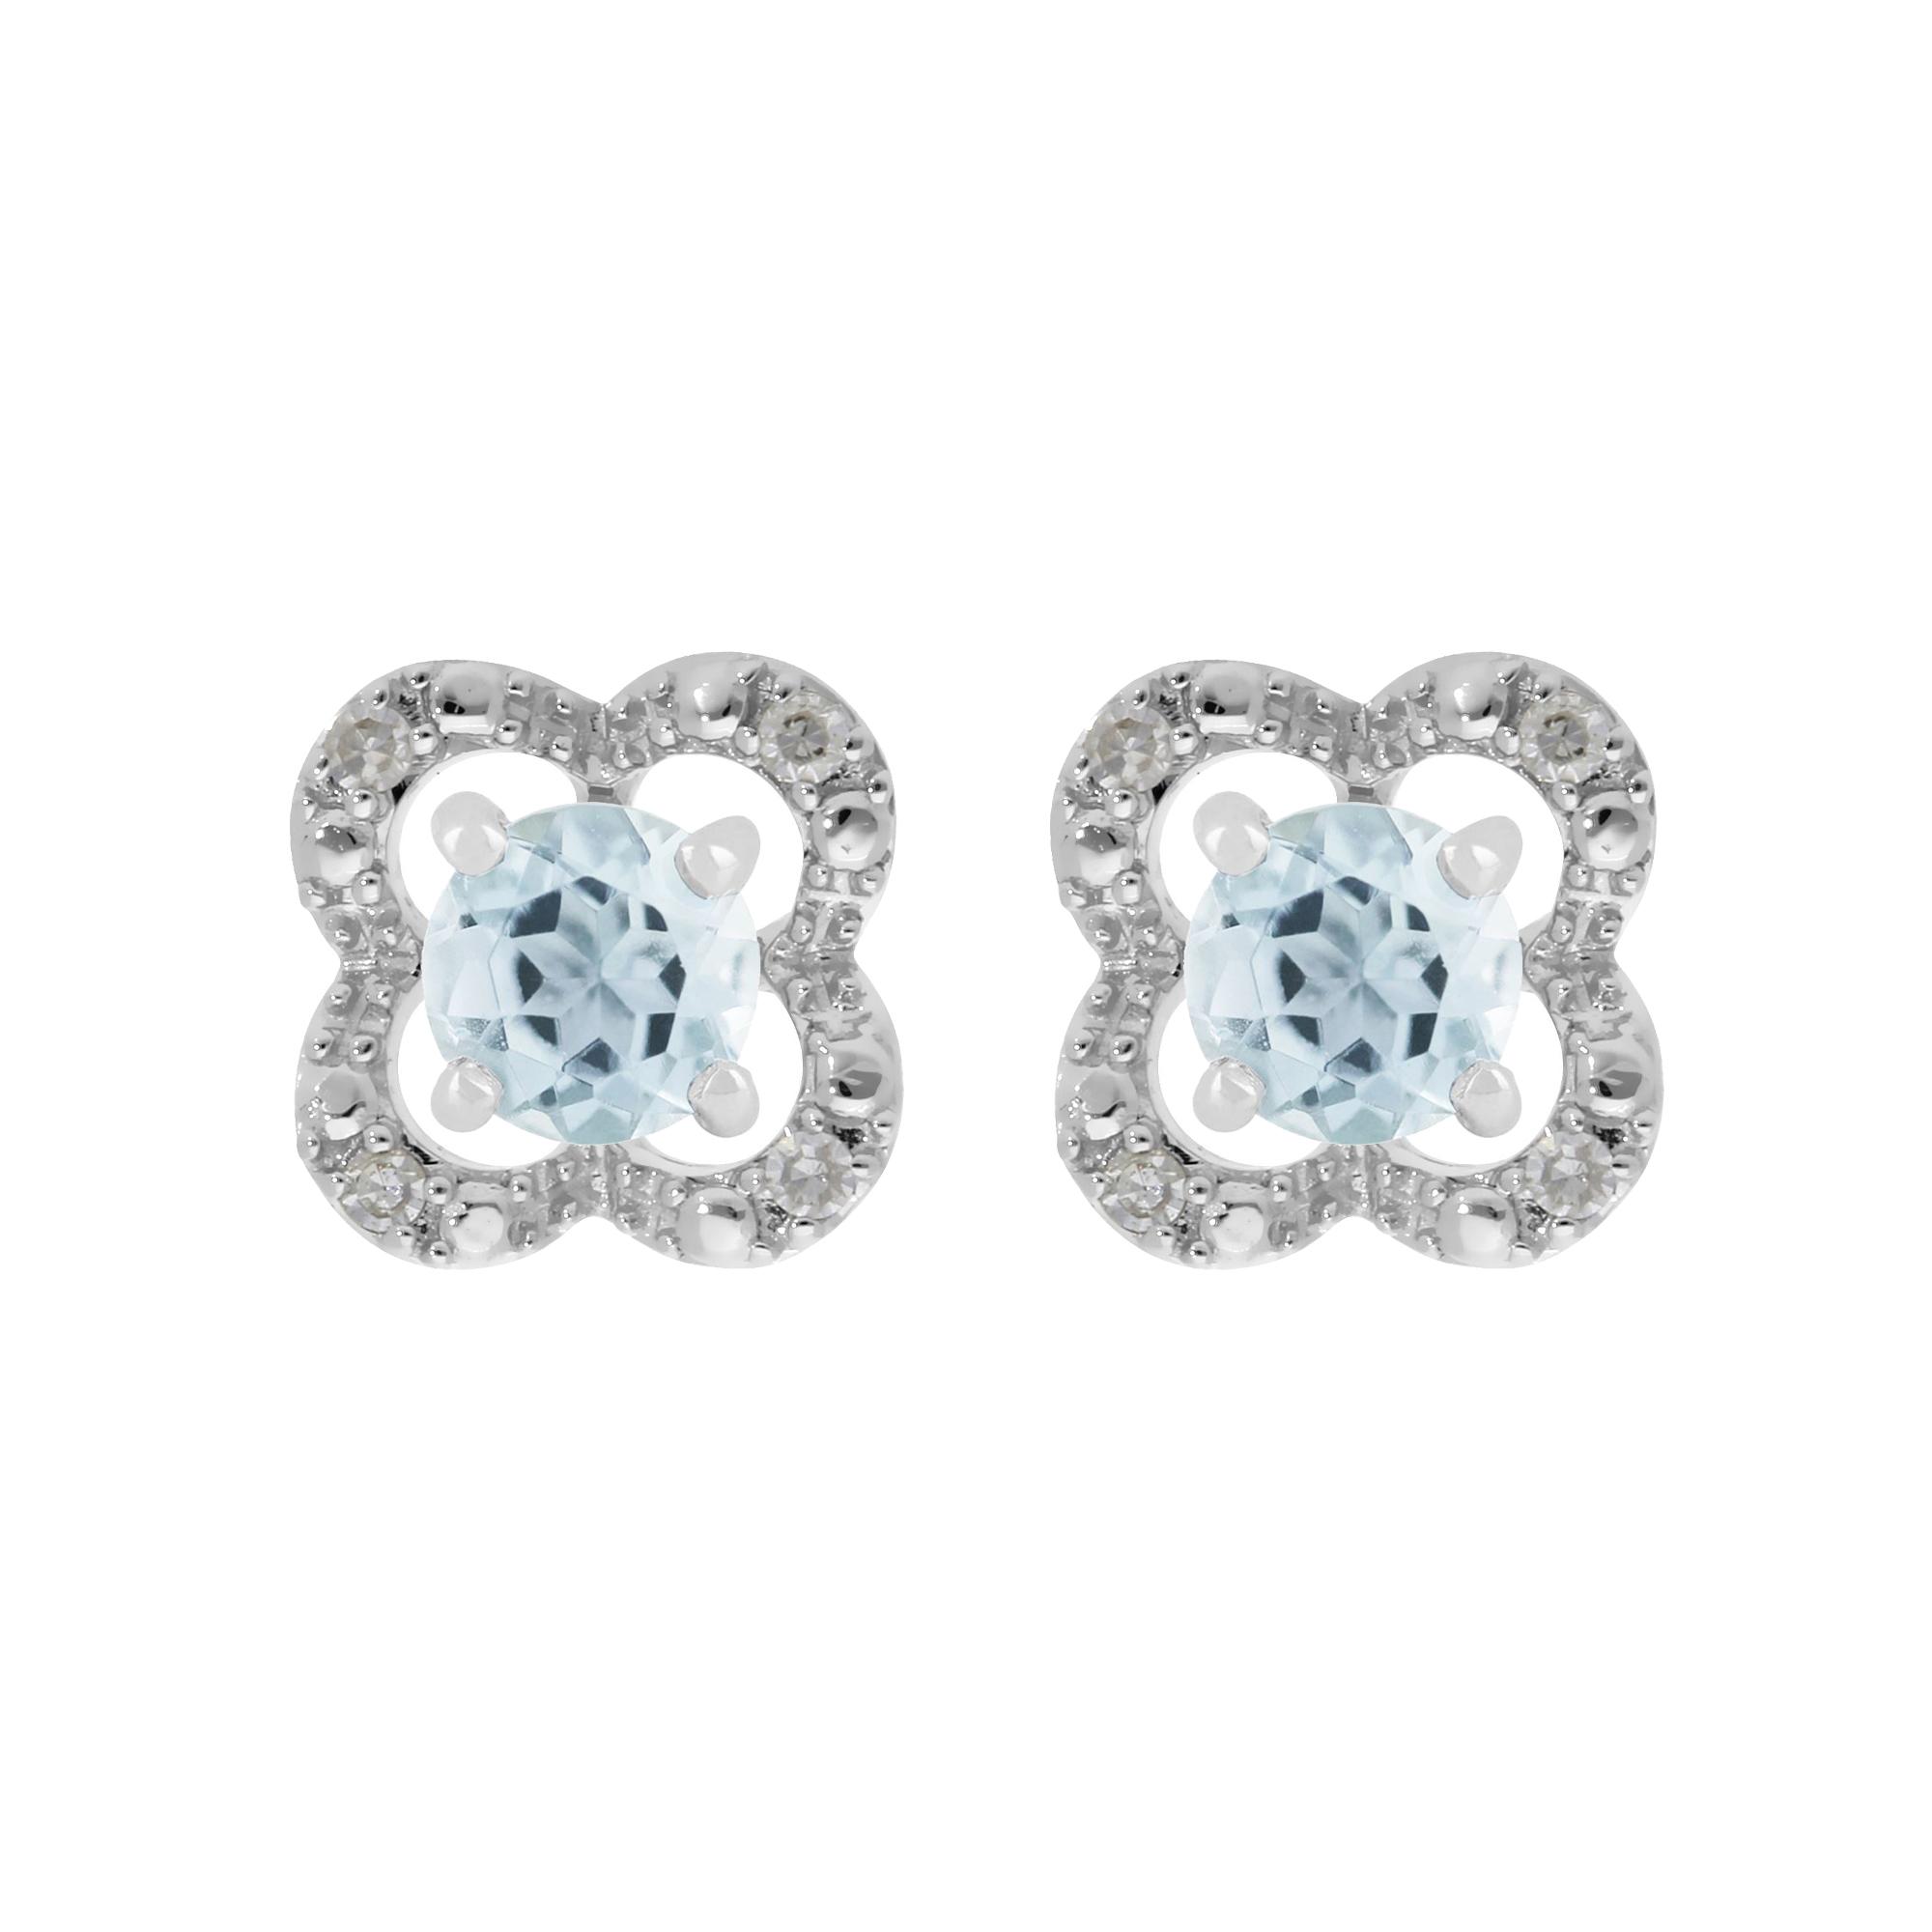 f4cc447874f02 Details about 9ct White Gold Aquamarine Stud Earrings & Detachable Diamond  Flower Ear Jacket